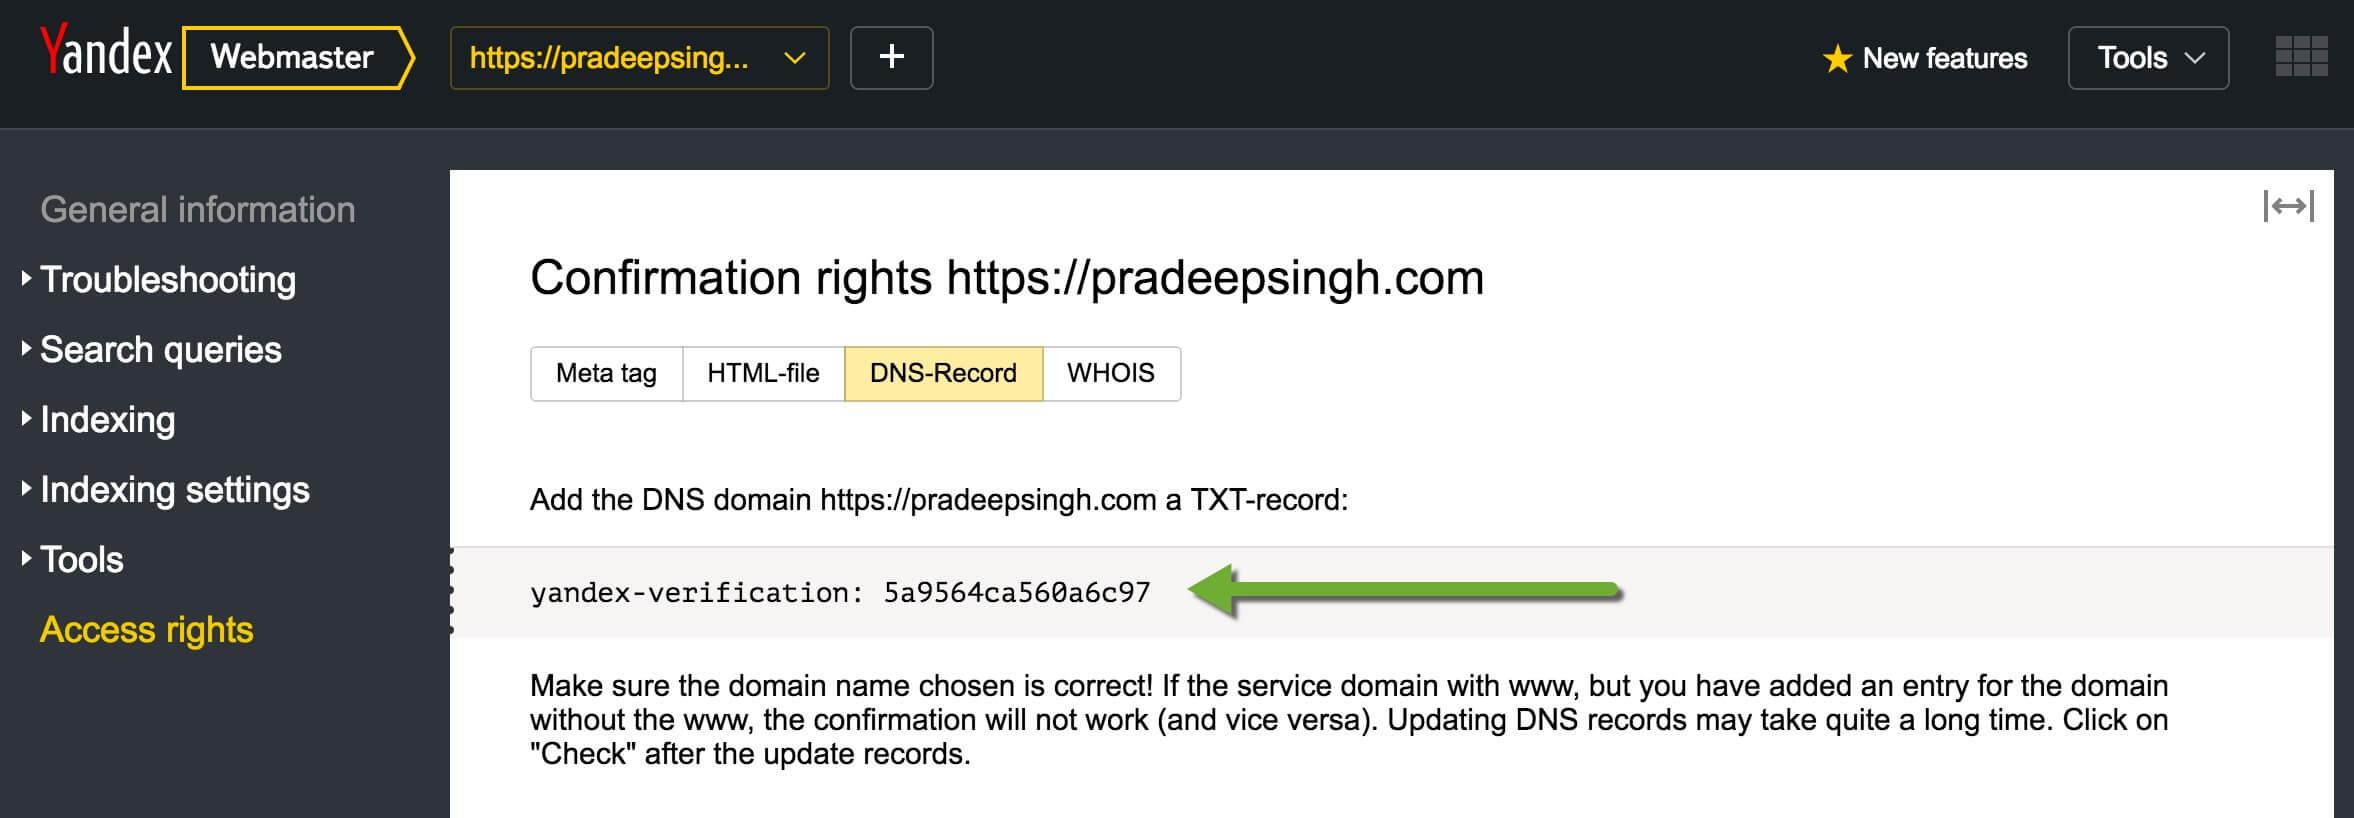 Yandex Webmasters tool Website Verification DNS